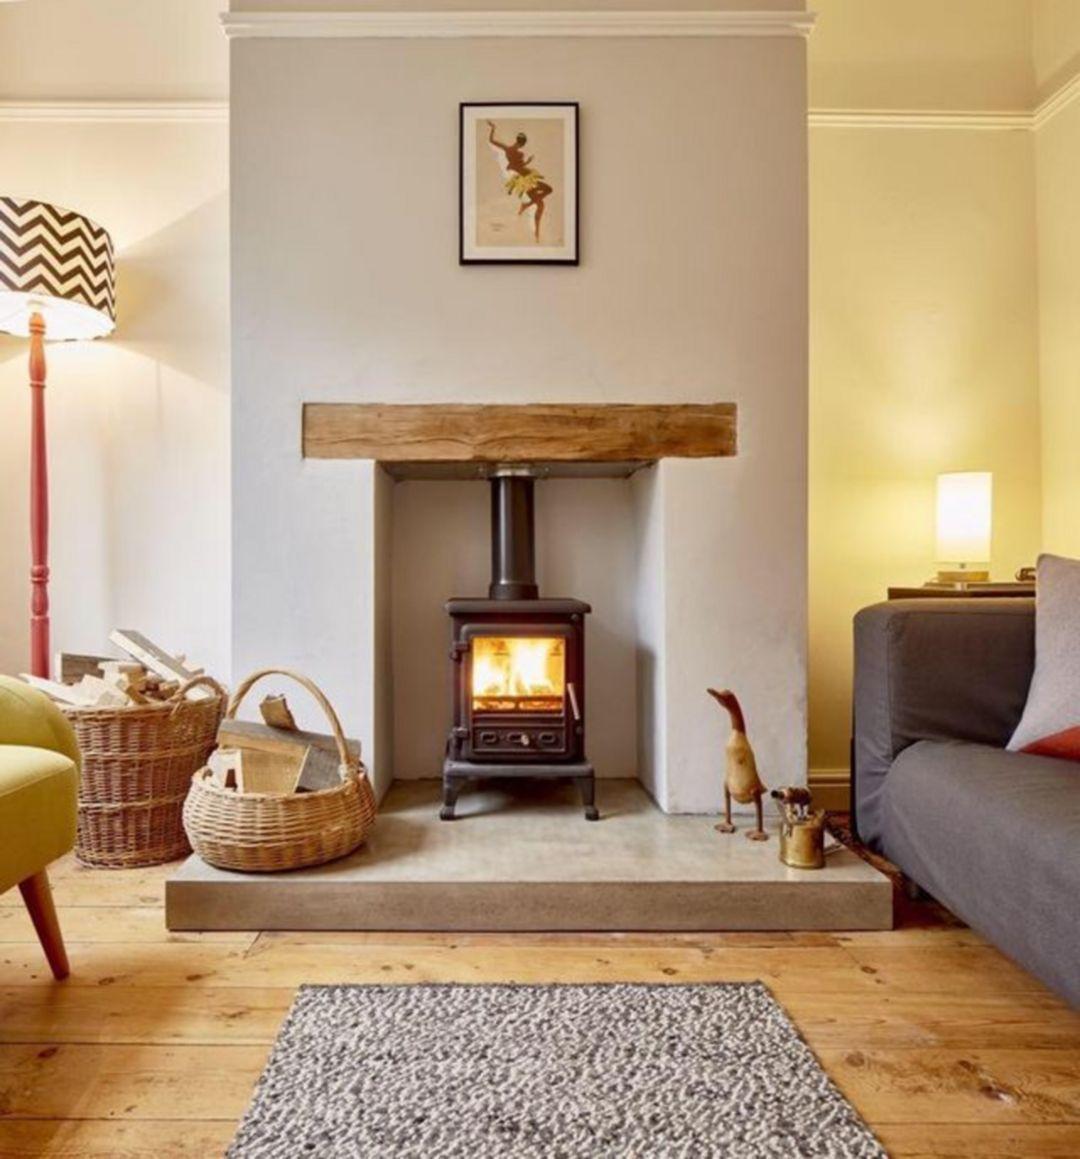 Wood Burning Stove Ideas Living Rooms 10 | Log burner ...